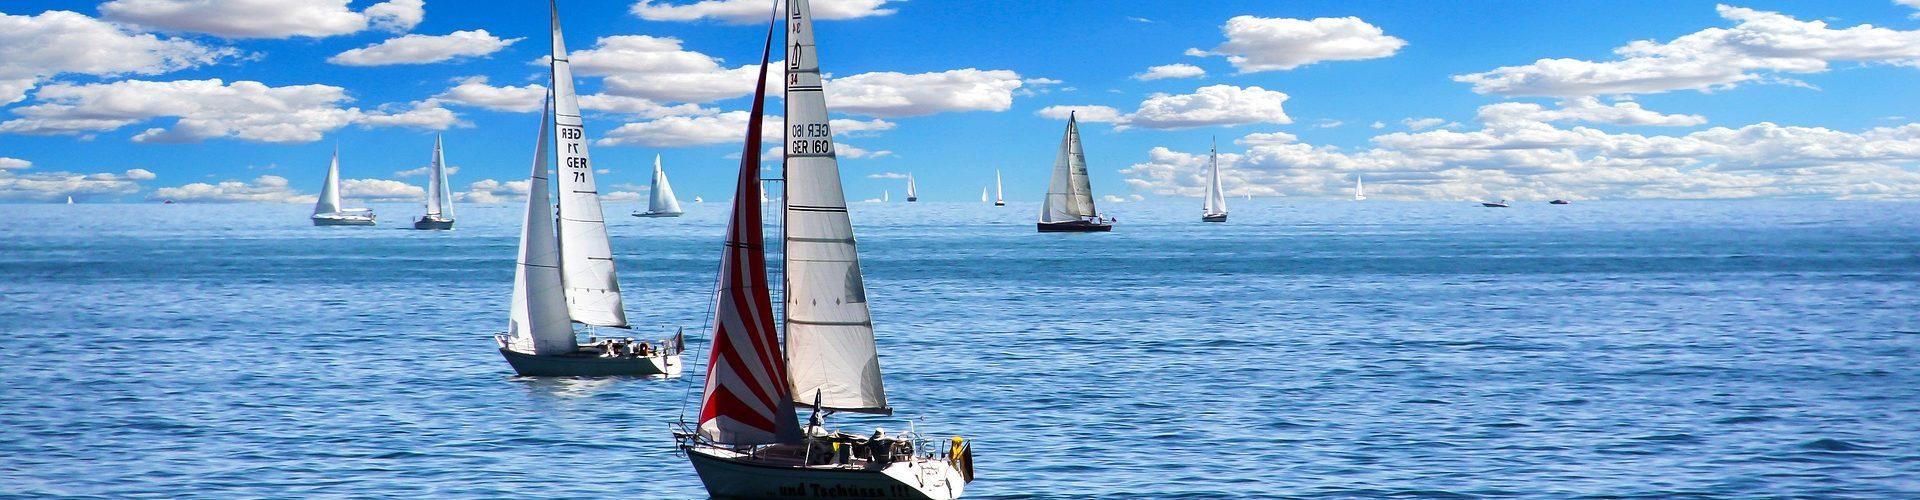 segeln lernen in Bad Hersfeld segelschein machen in Bad Hersfeld 1920x500 - Segeln lernen in Bad Hersfeld